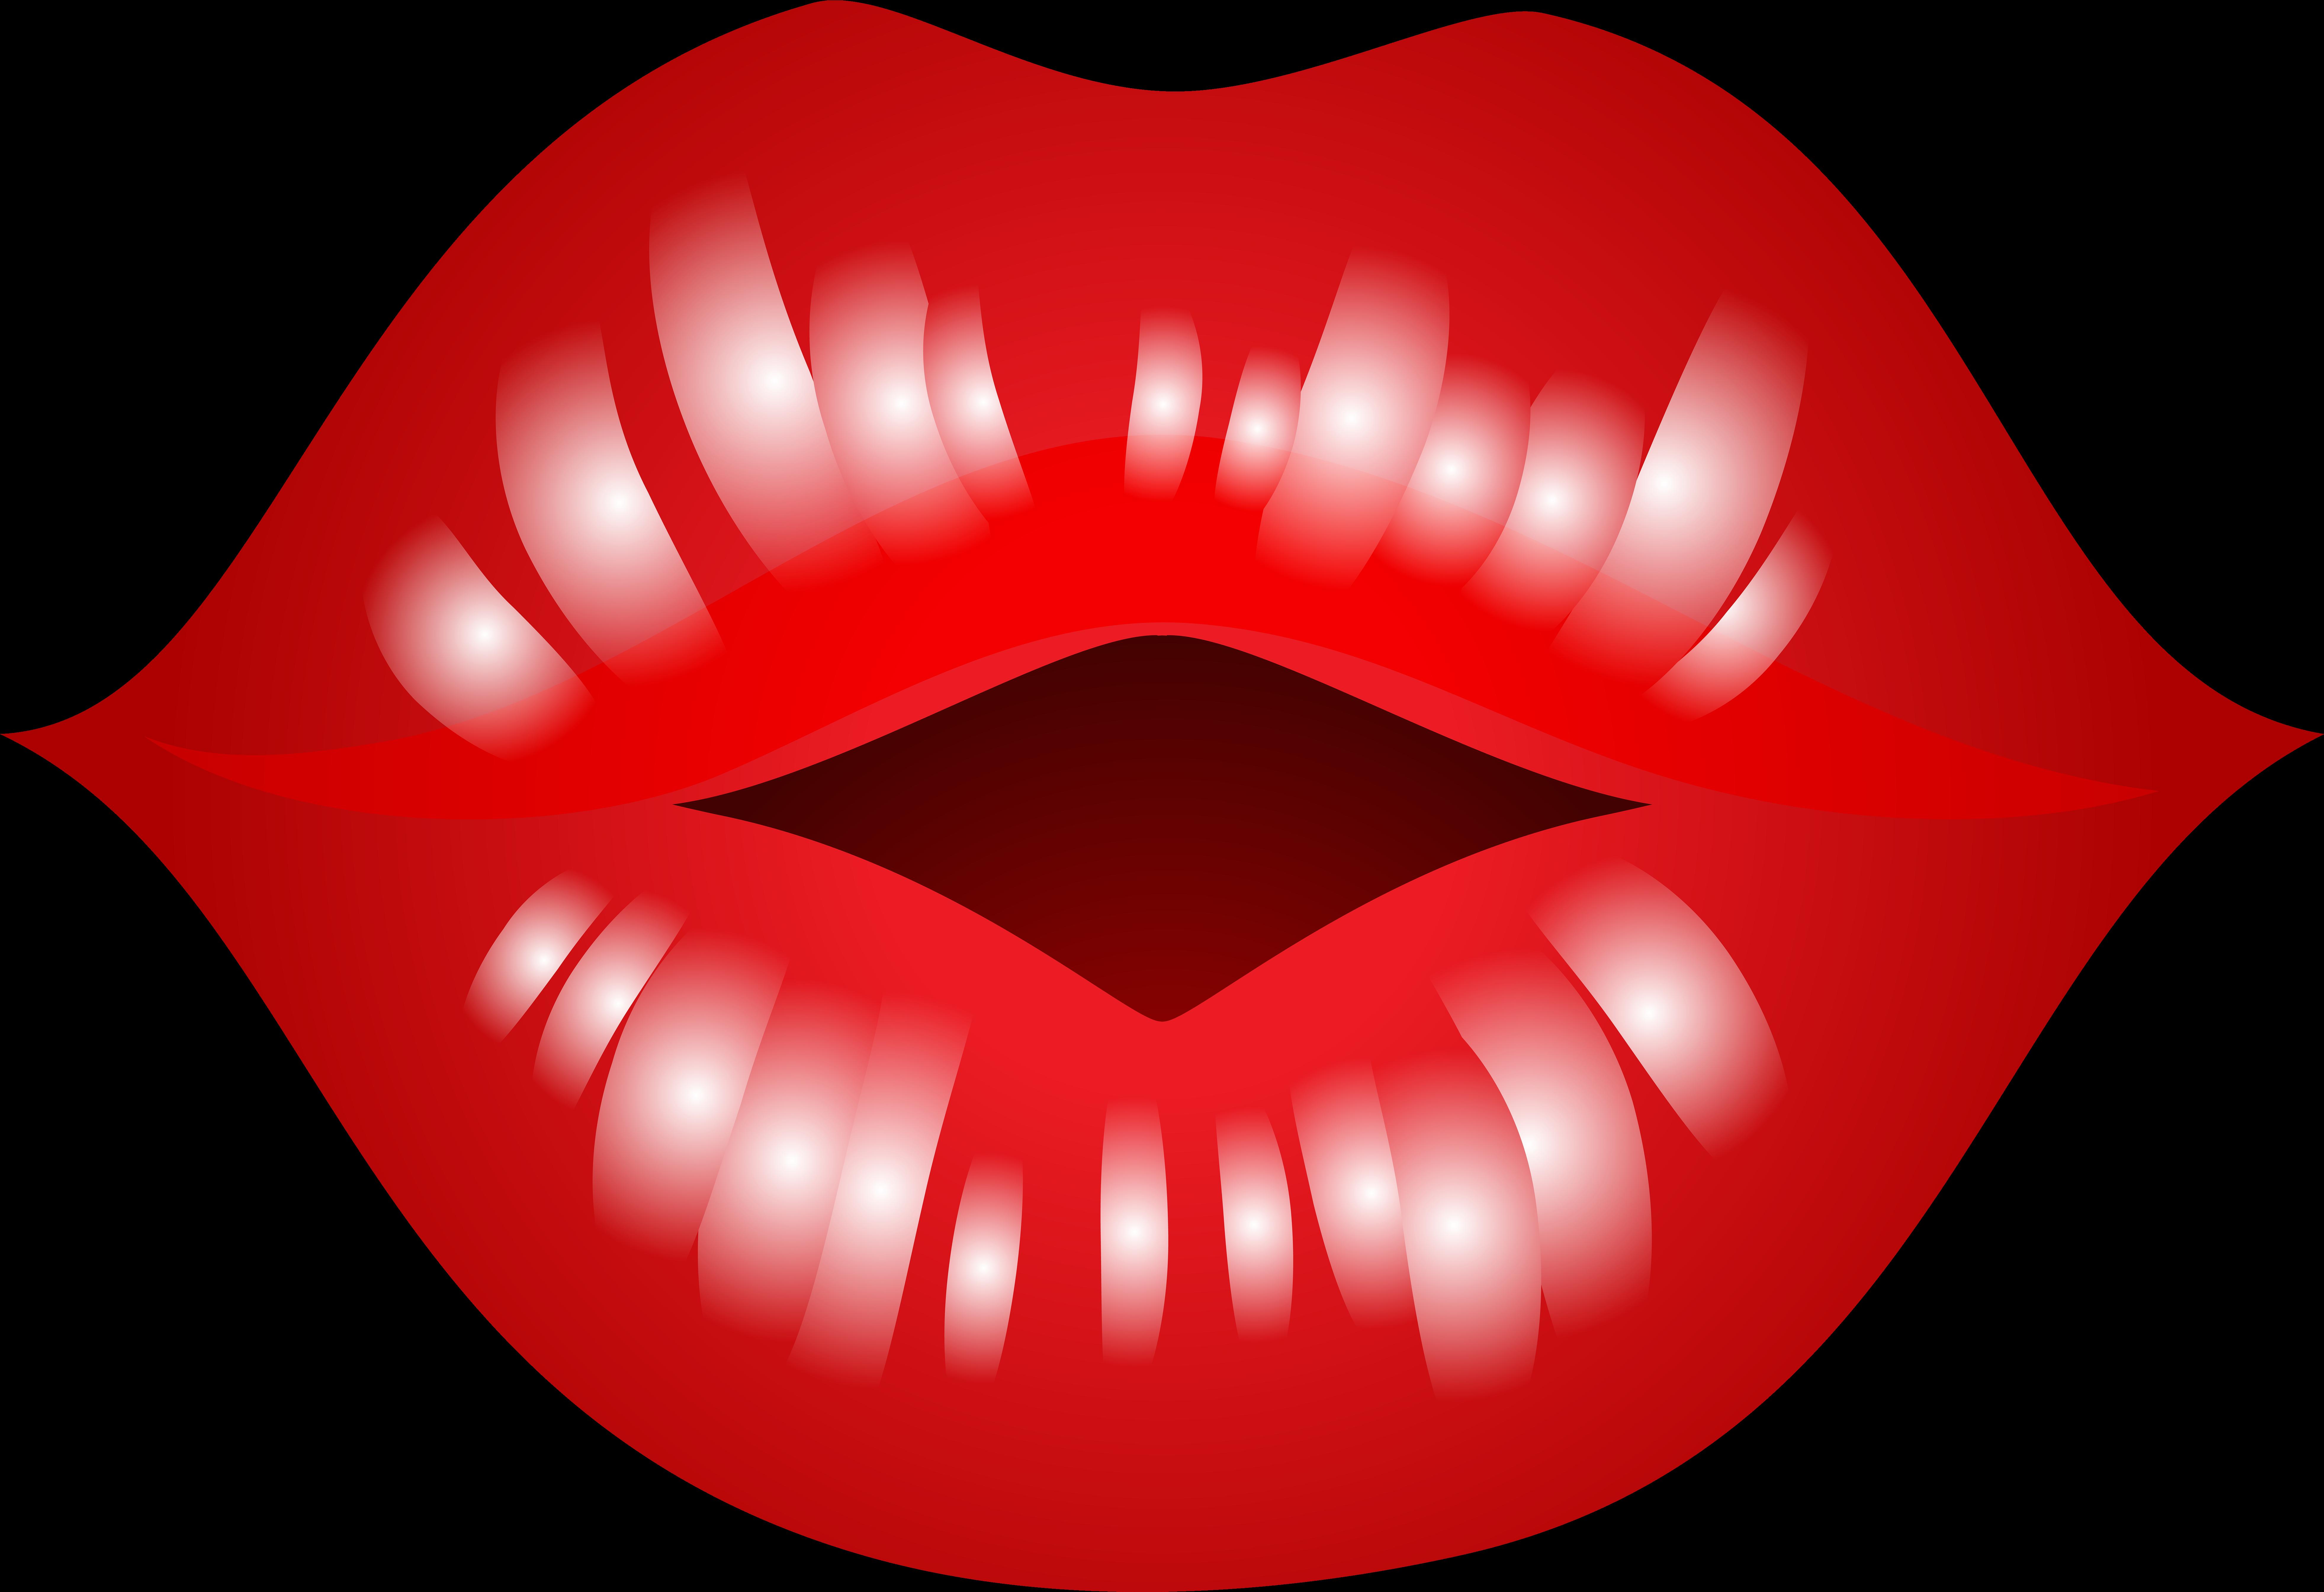 Открытки, картинки с губами поцелуями